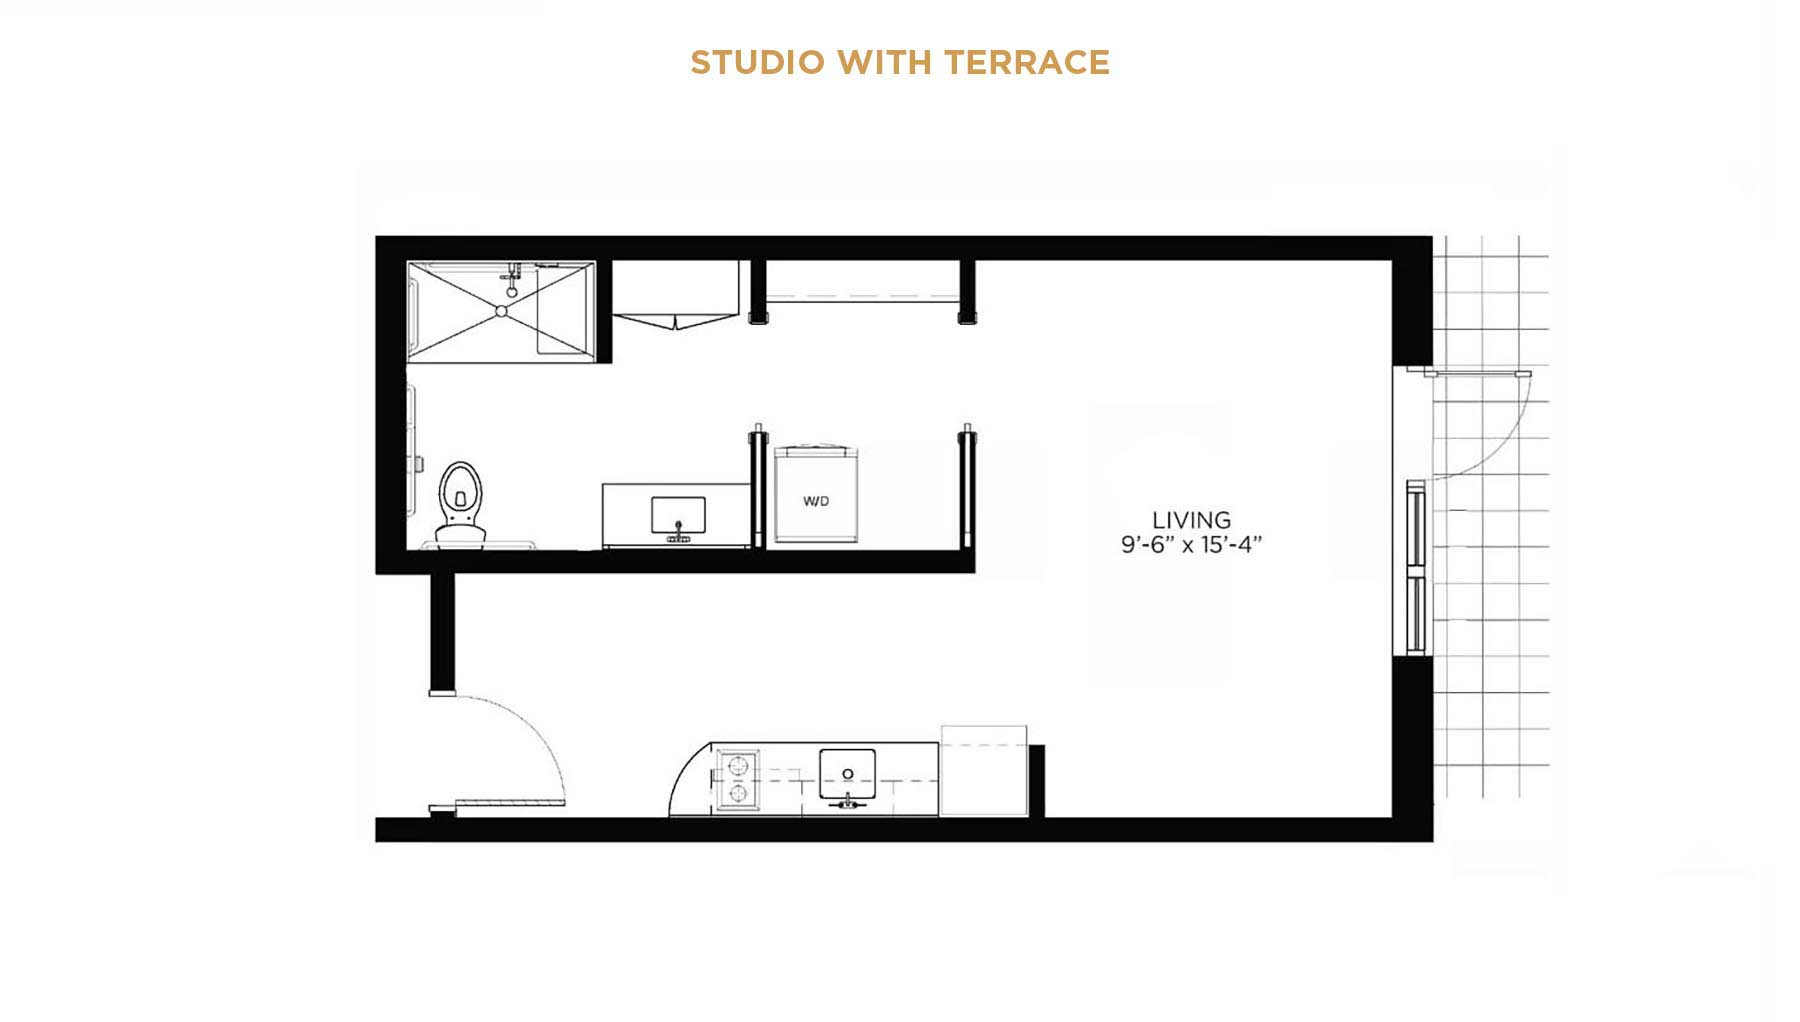 studio floorplan with terrace